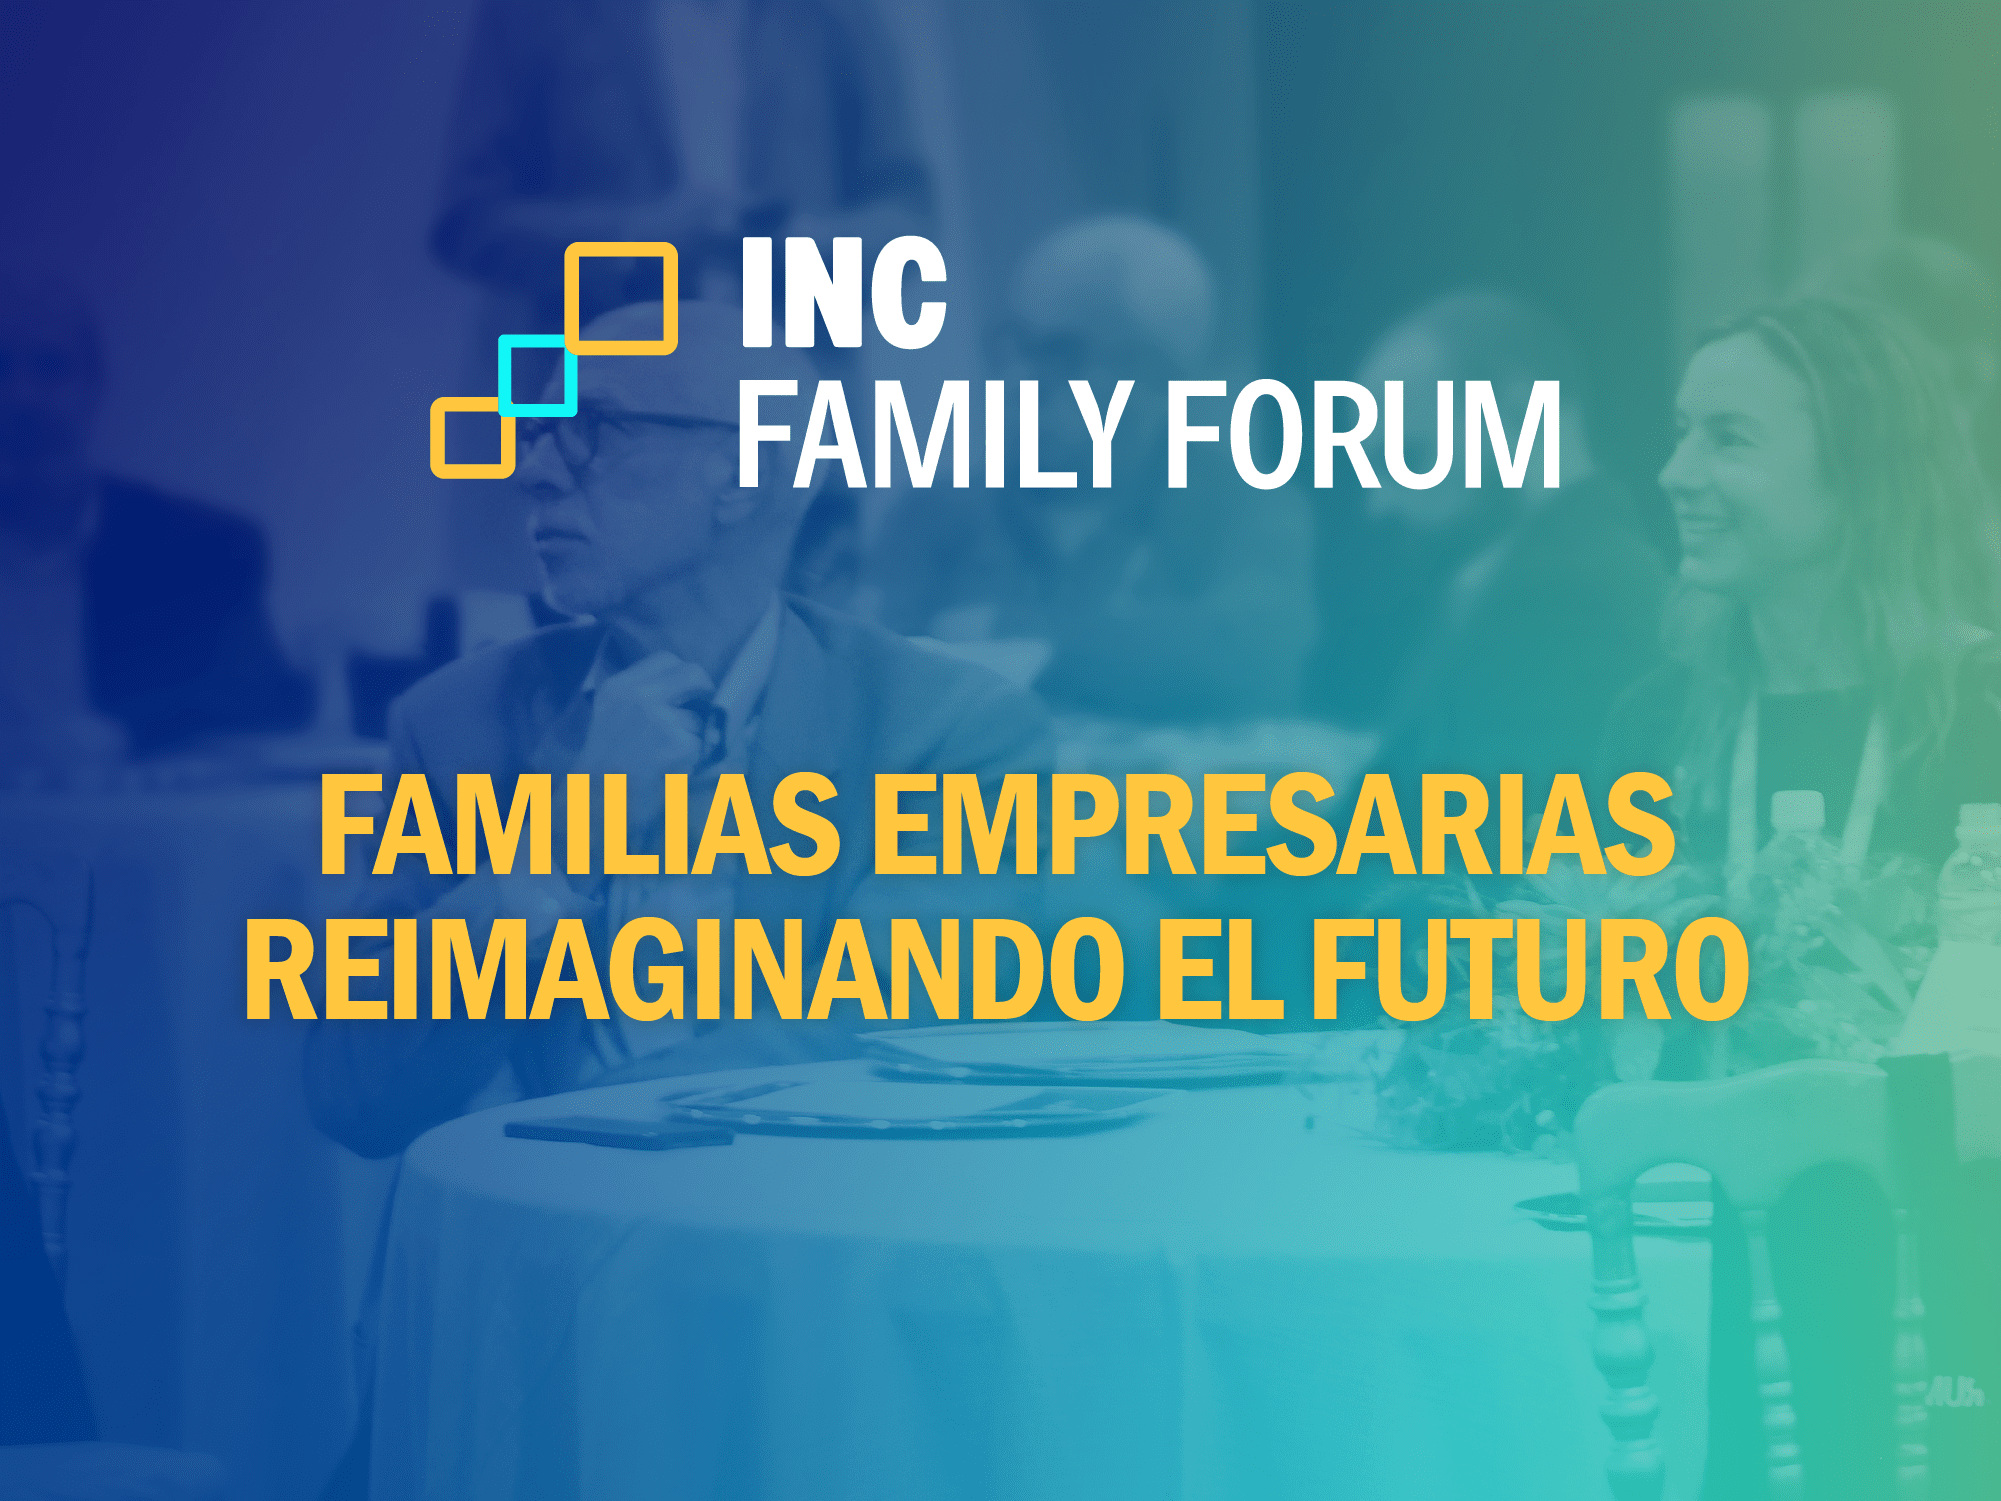 INC Family Forum: Familias empresarias reimaginando el futuro